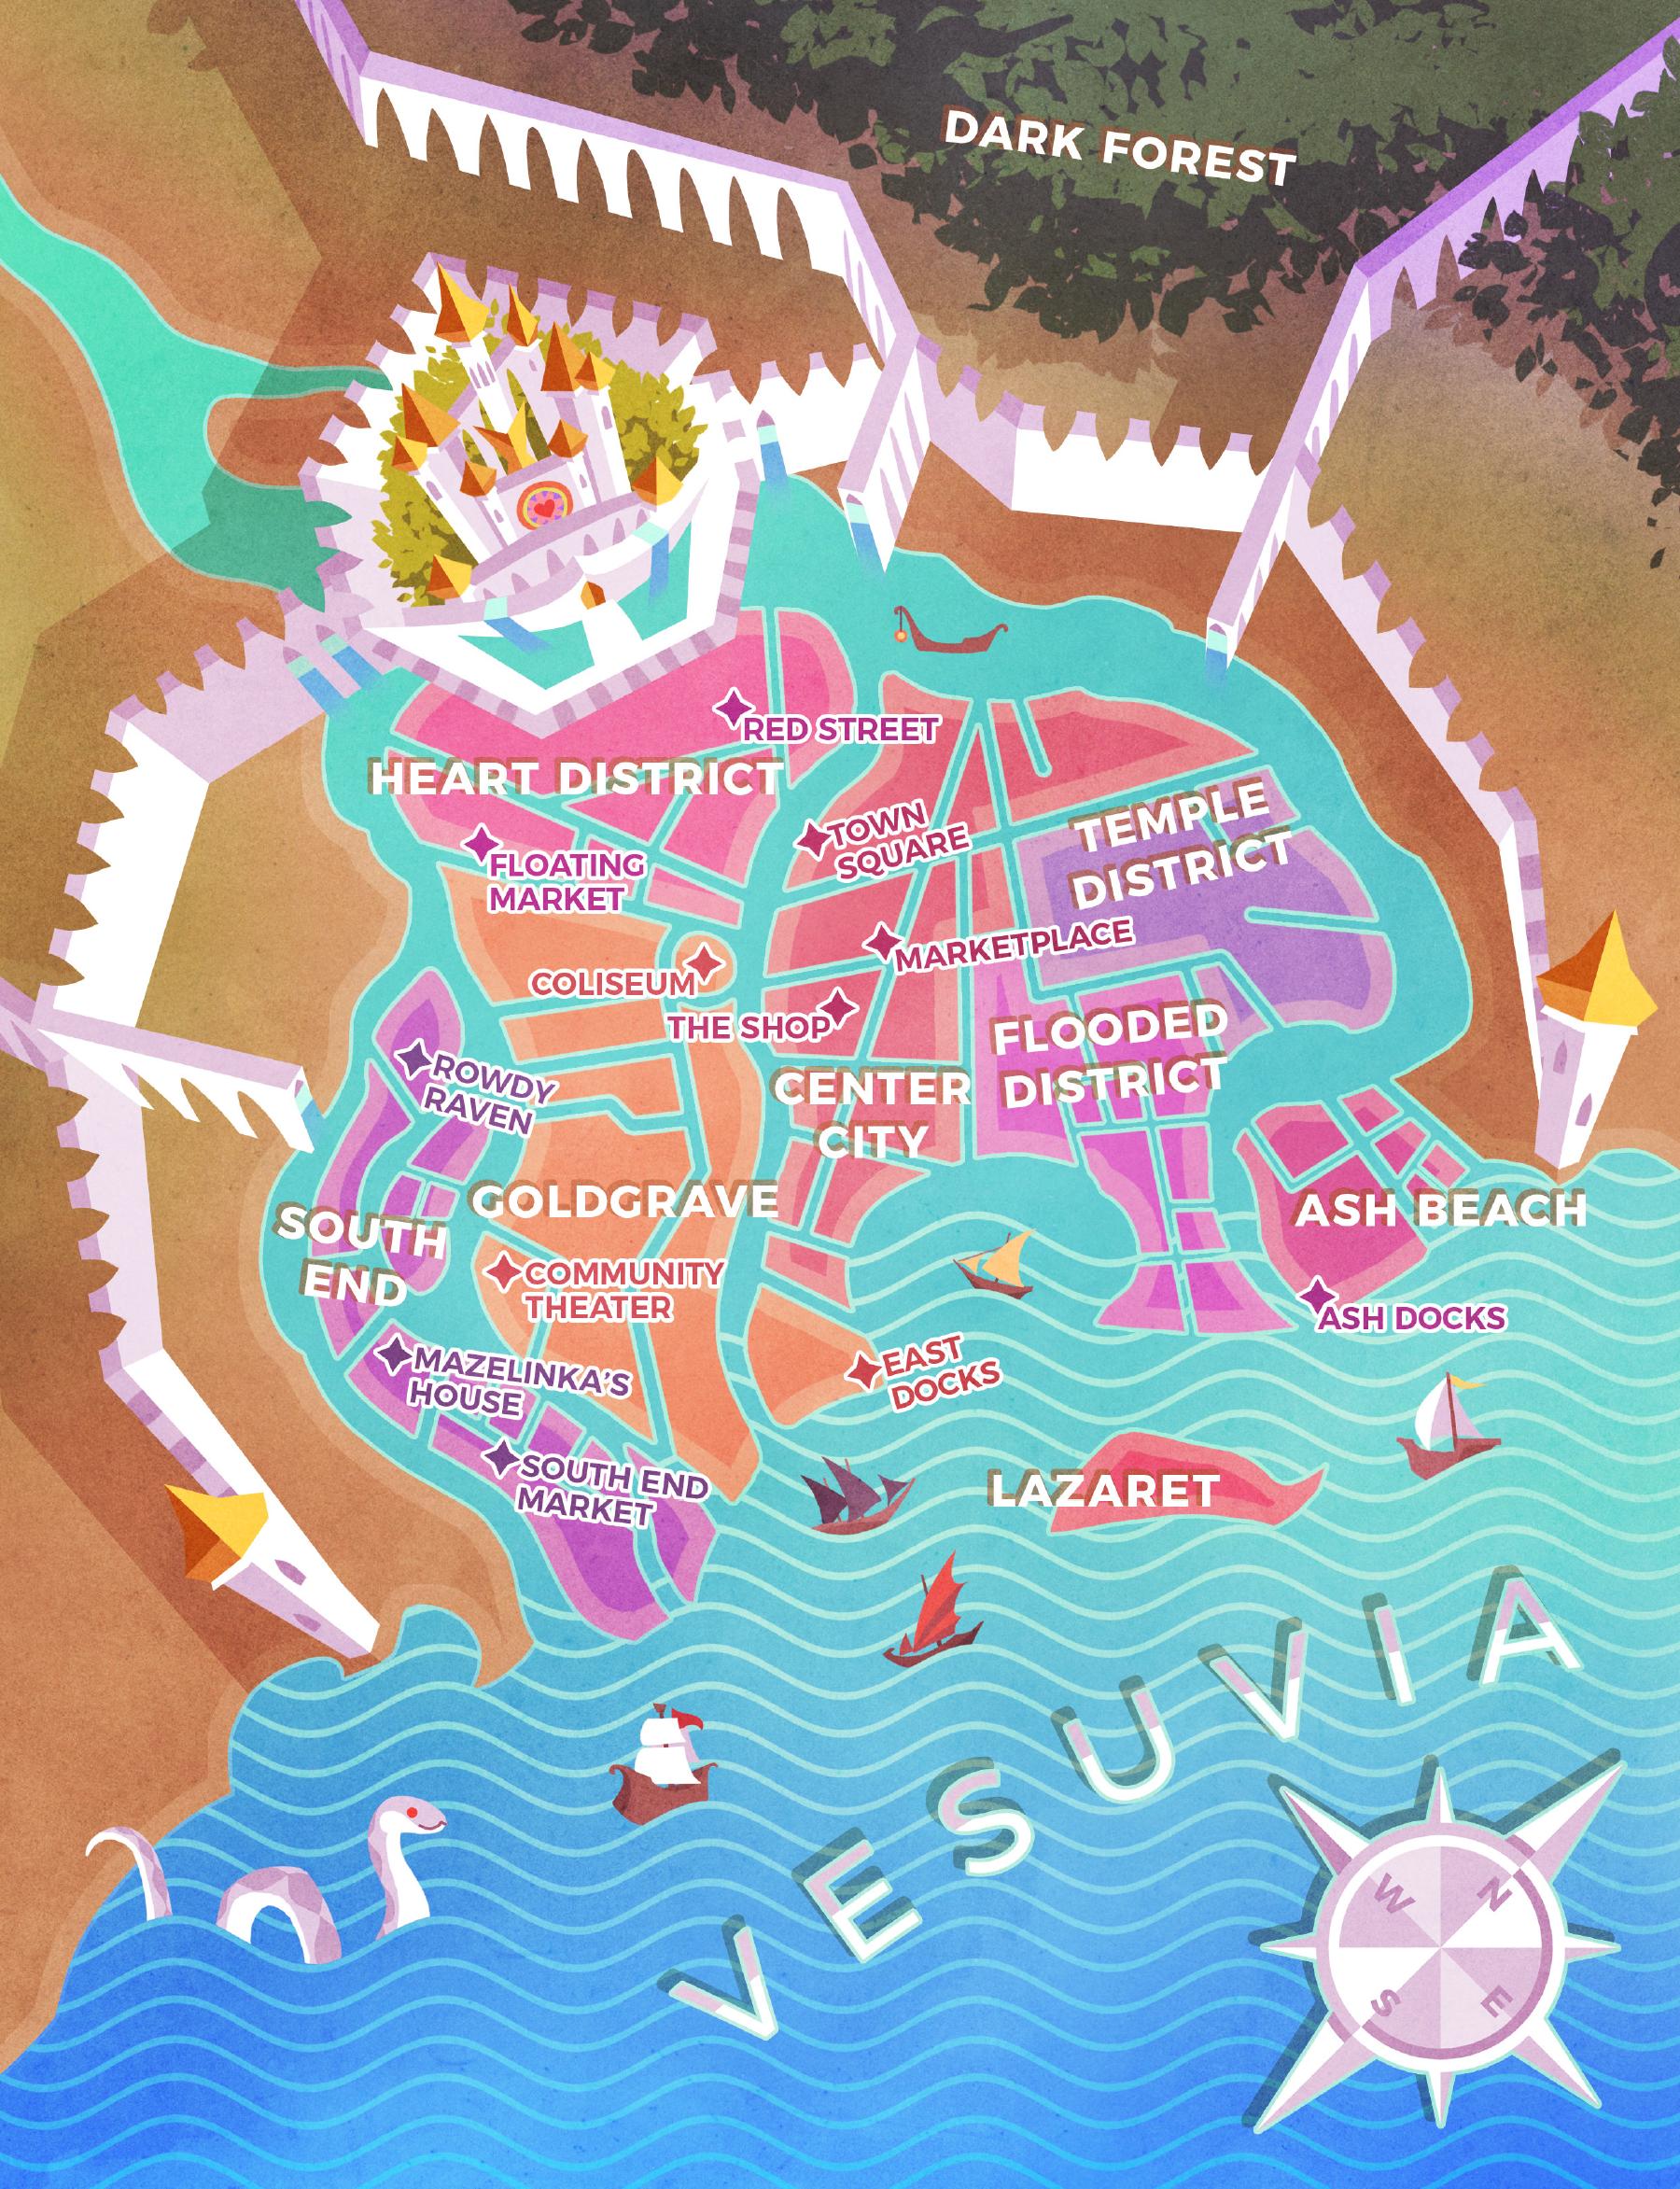 Vesuvia   The Arcana (game) Wiki   FANDOM powered by Wikia